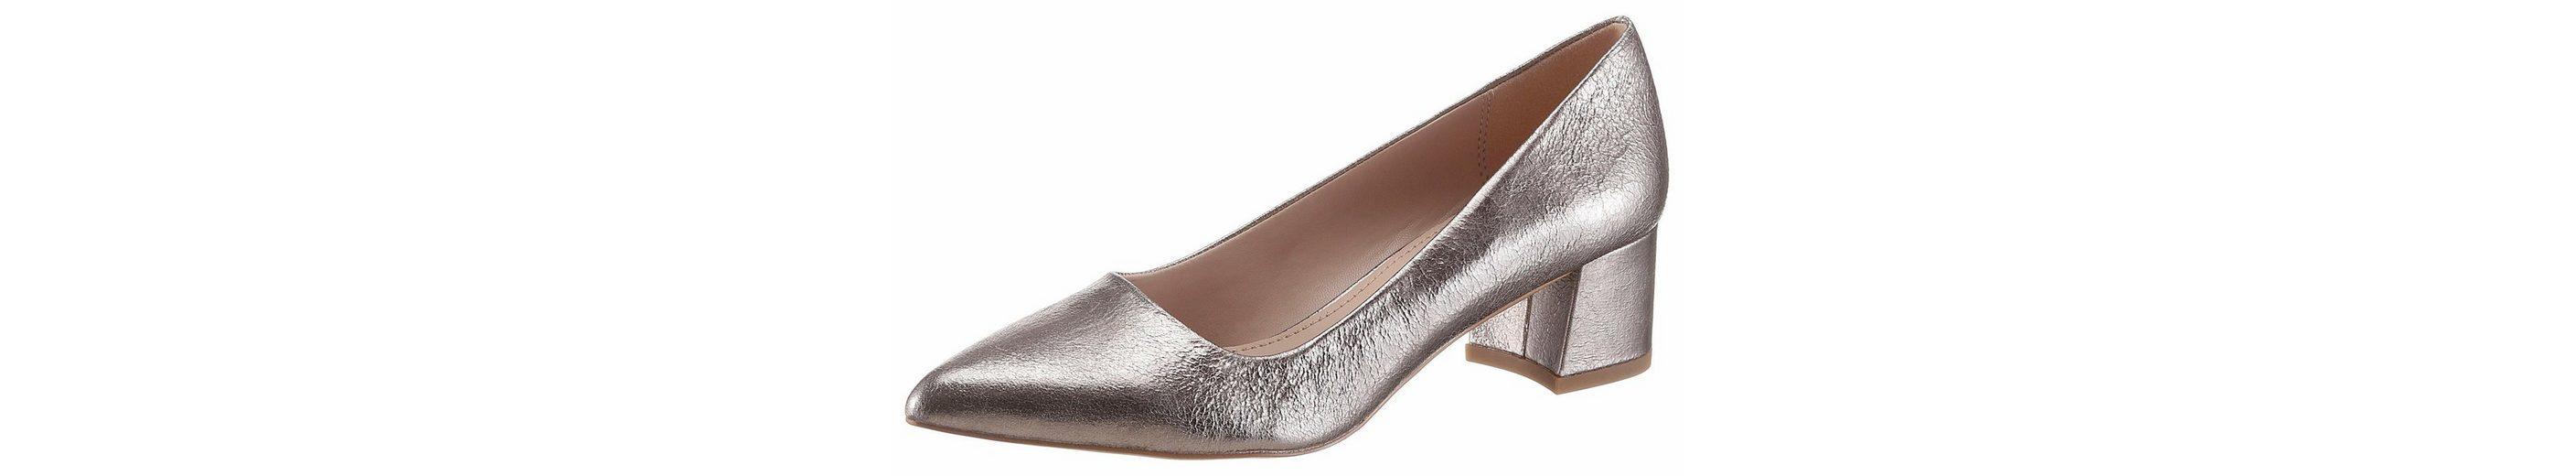 ESPRIT Laurel Pump Pumps, im glänzenden Metallic-Look